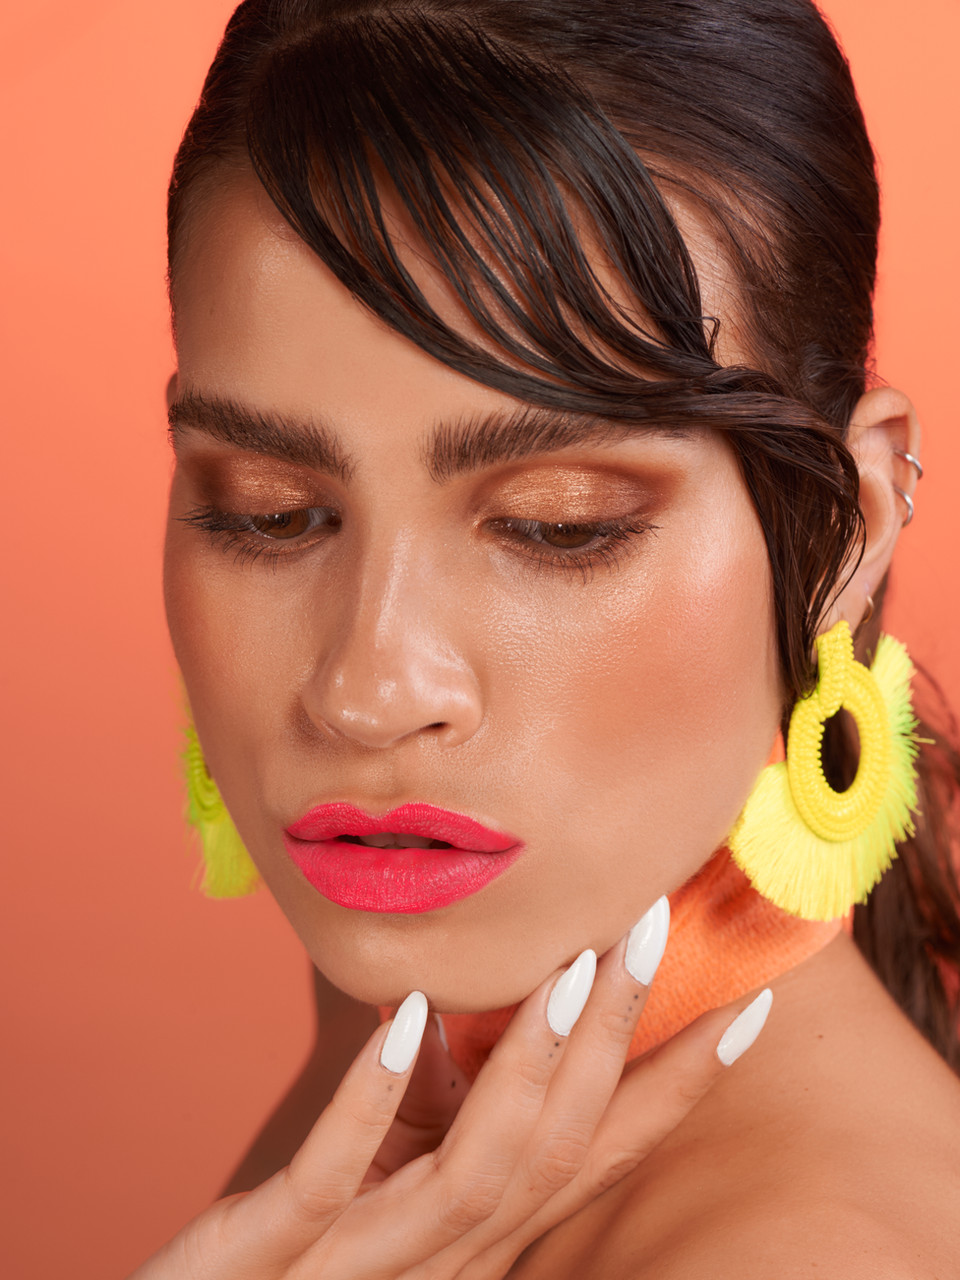 caitlin wyman editorial beauty neon lips